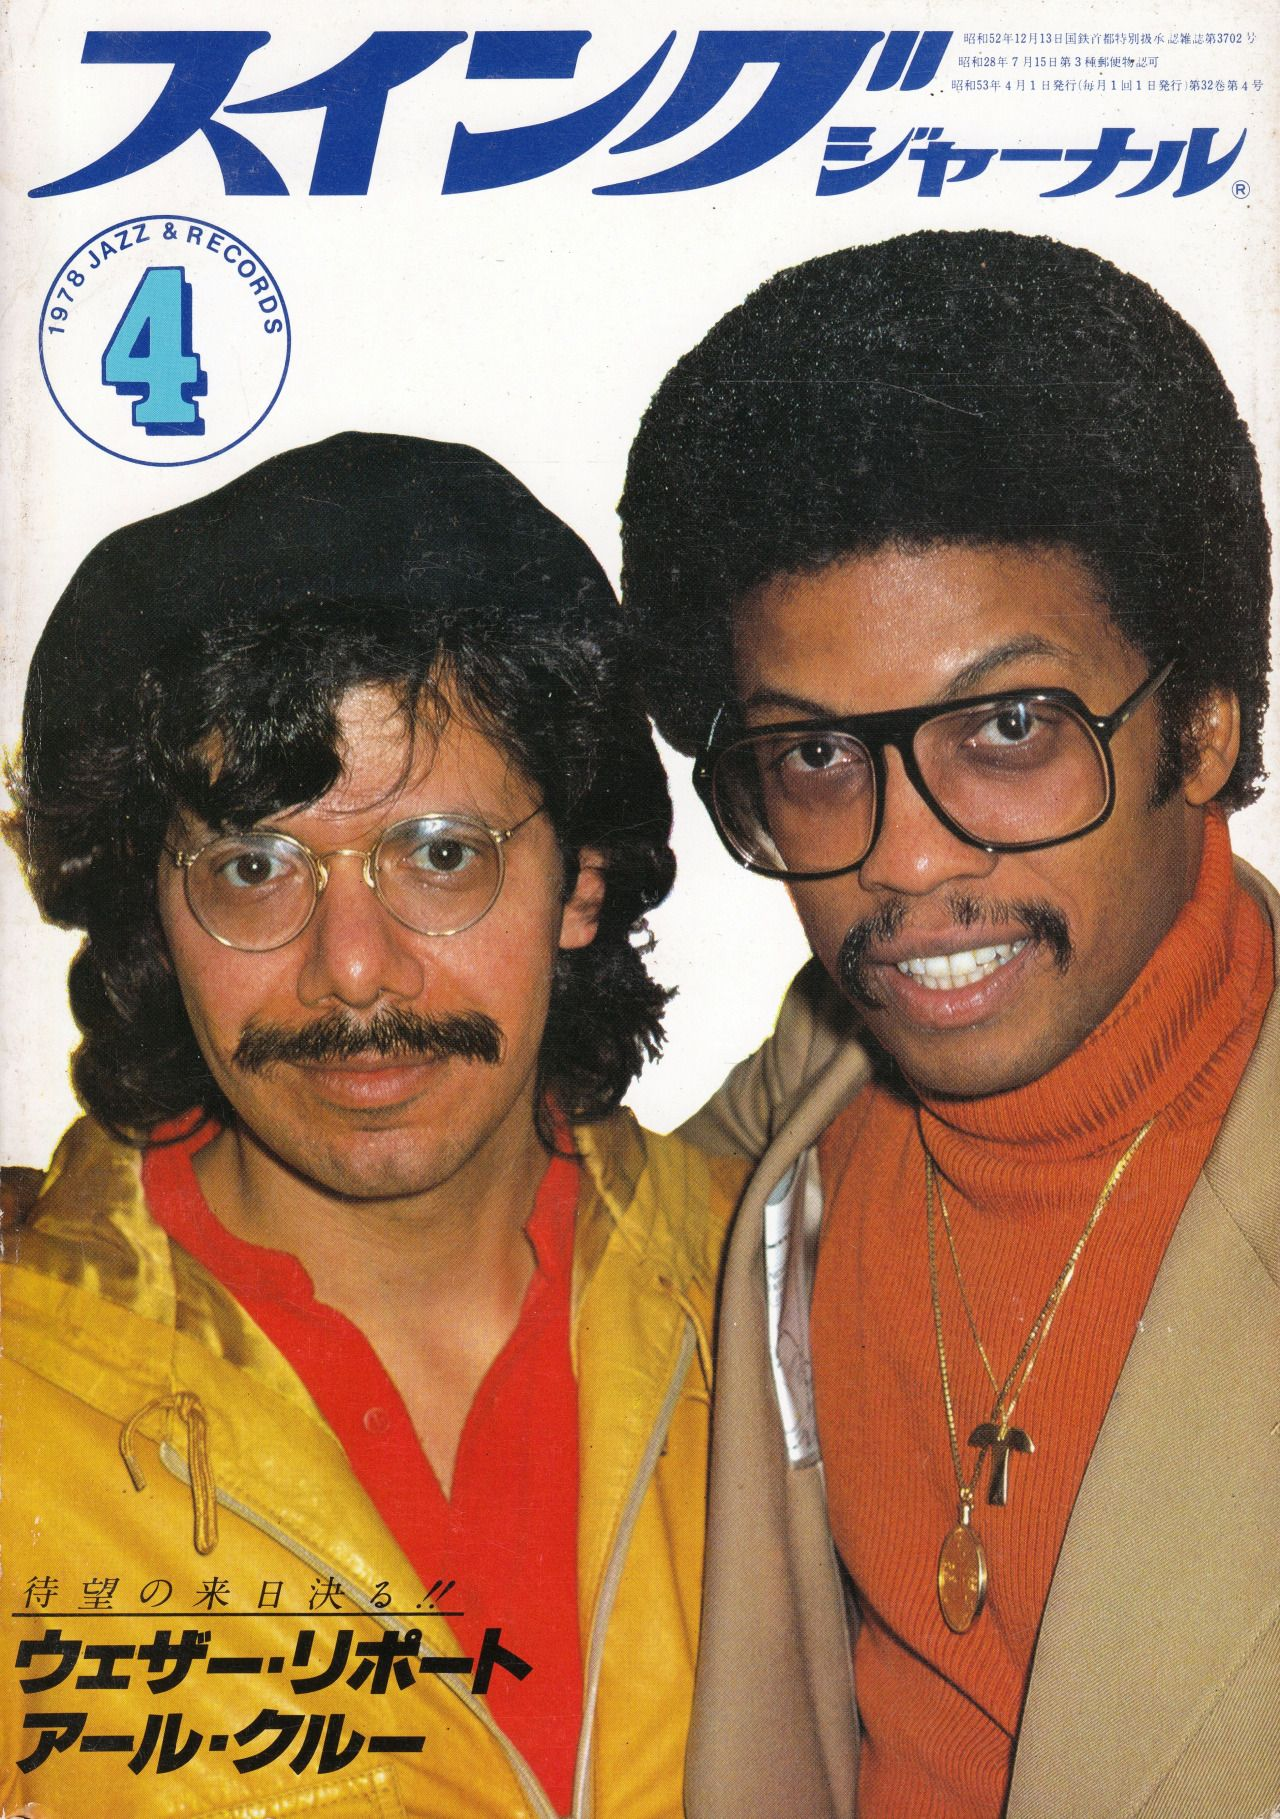 Chick Corea & Herbie Hancock